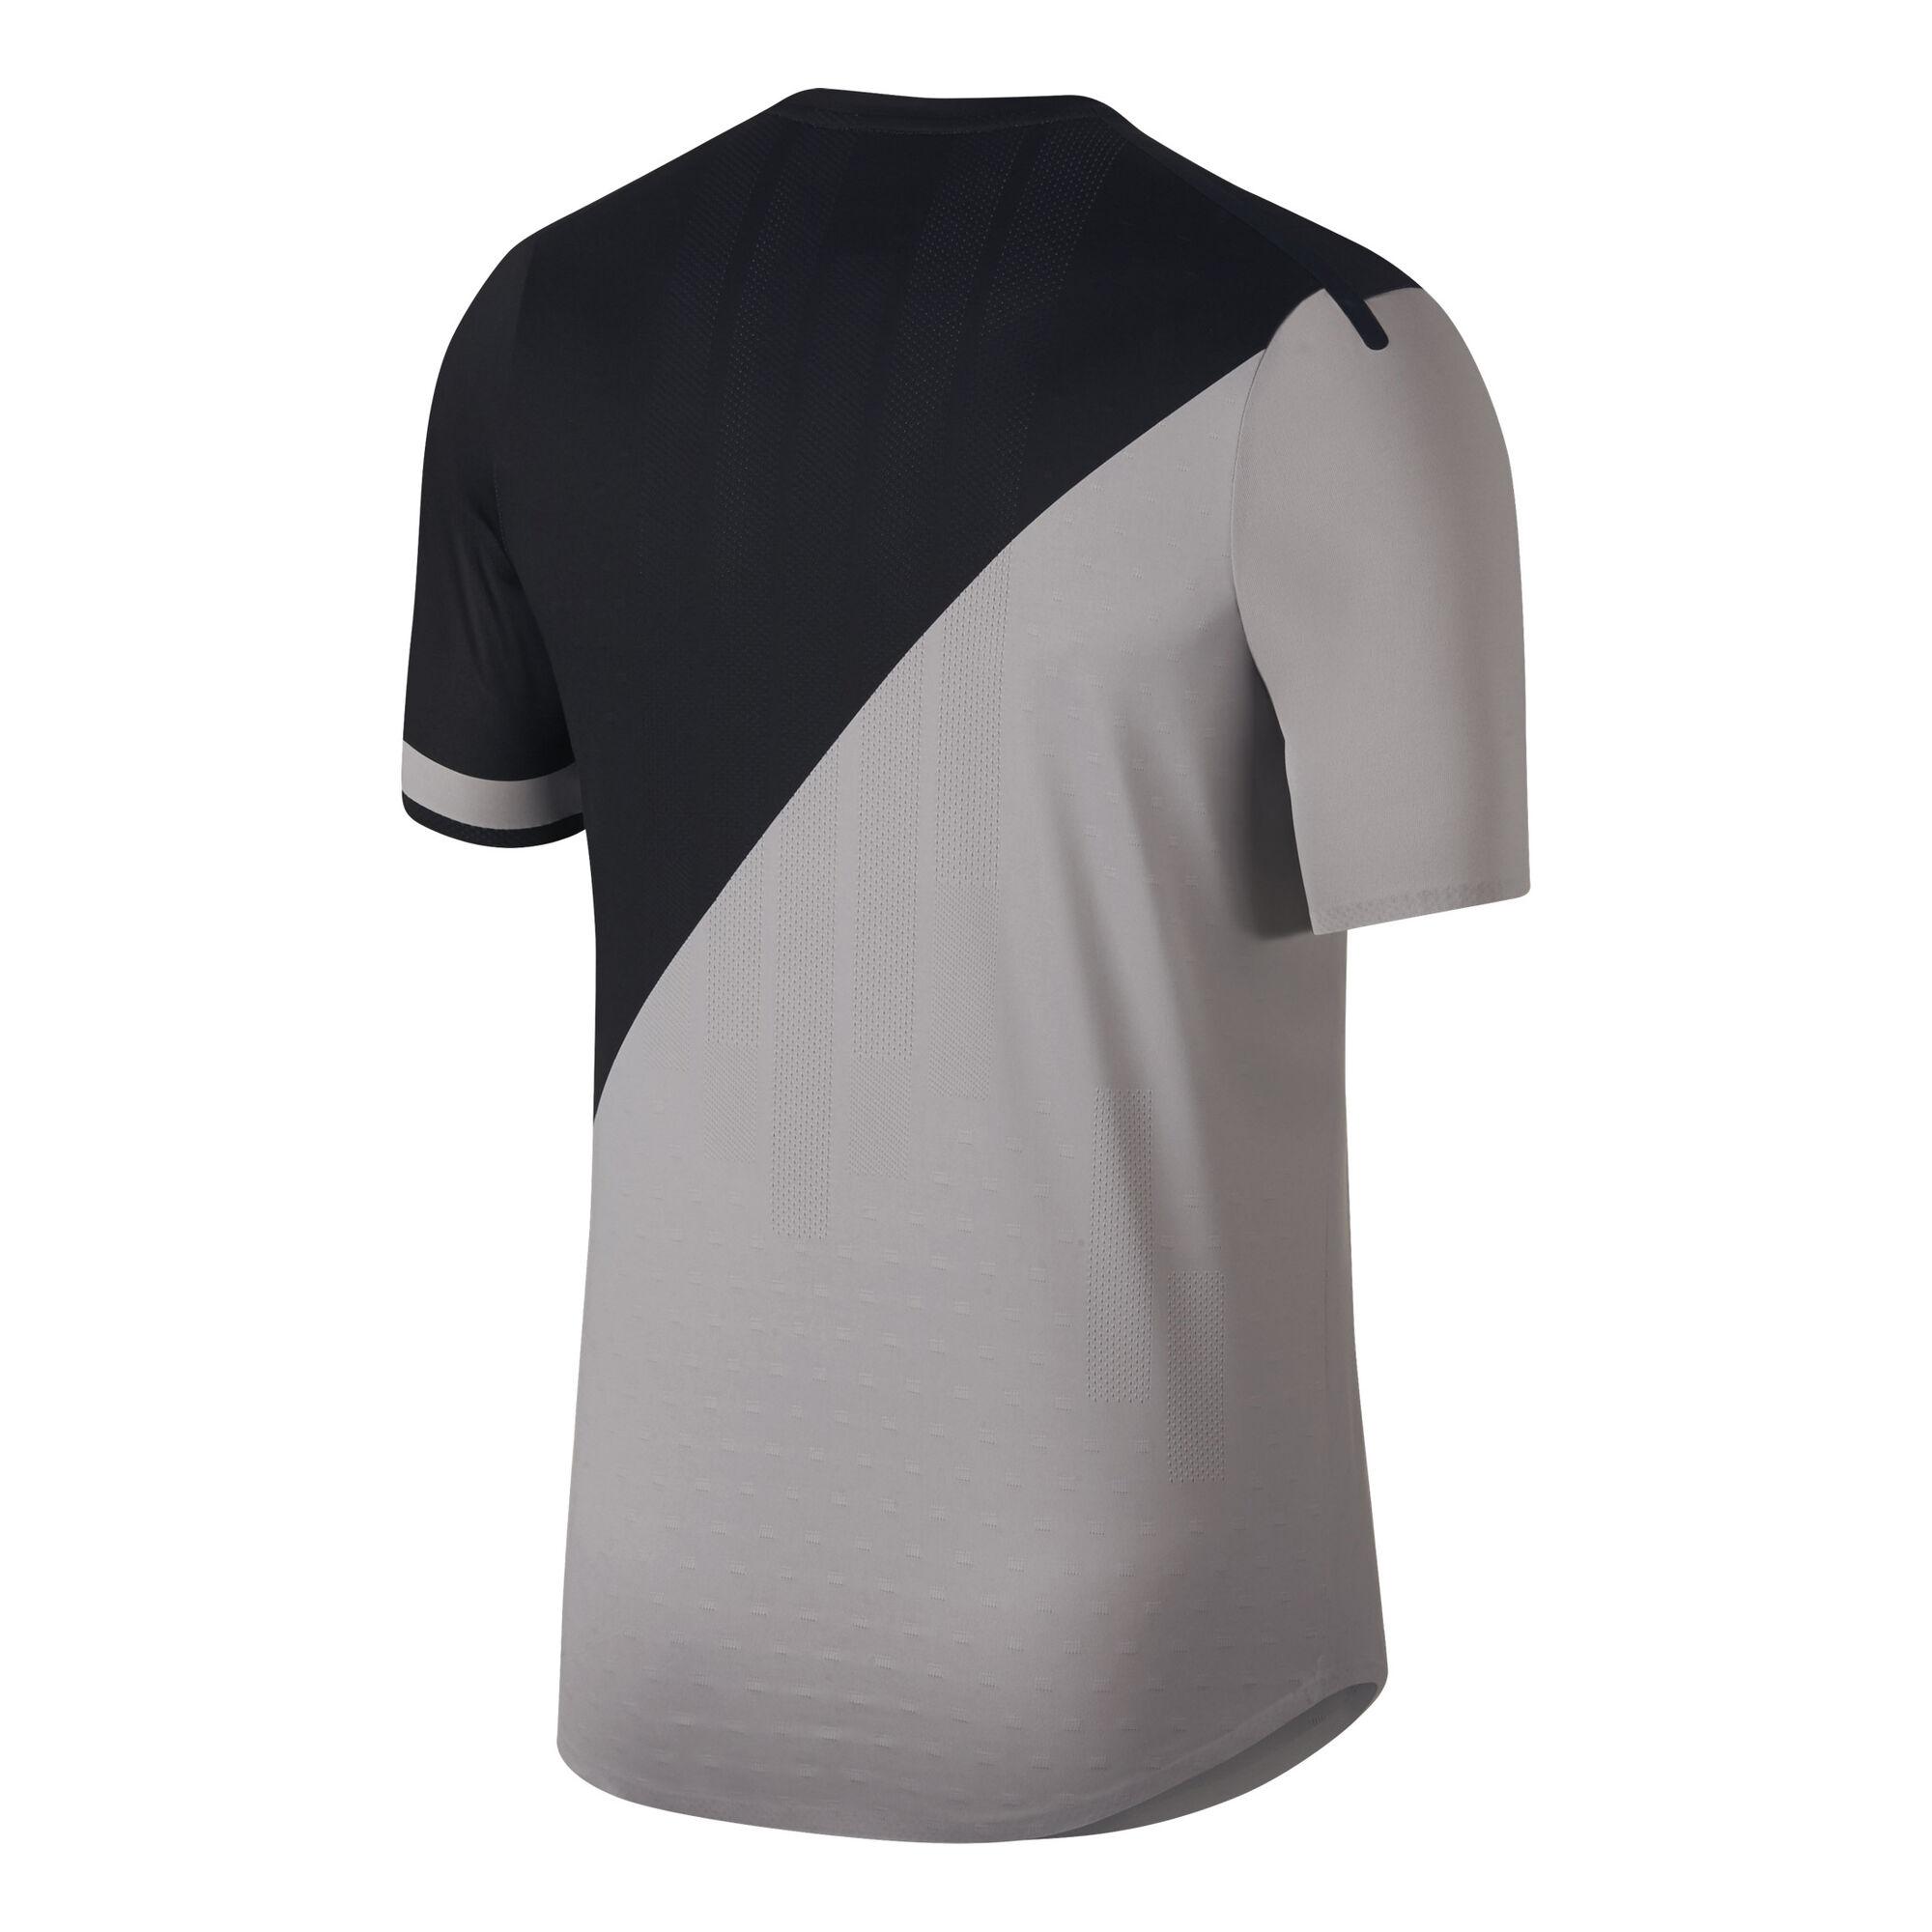 d0ee4867983 Nike Court Zonal Cooling Challenger T-shirt Heren - Grijs, Zwart ...